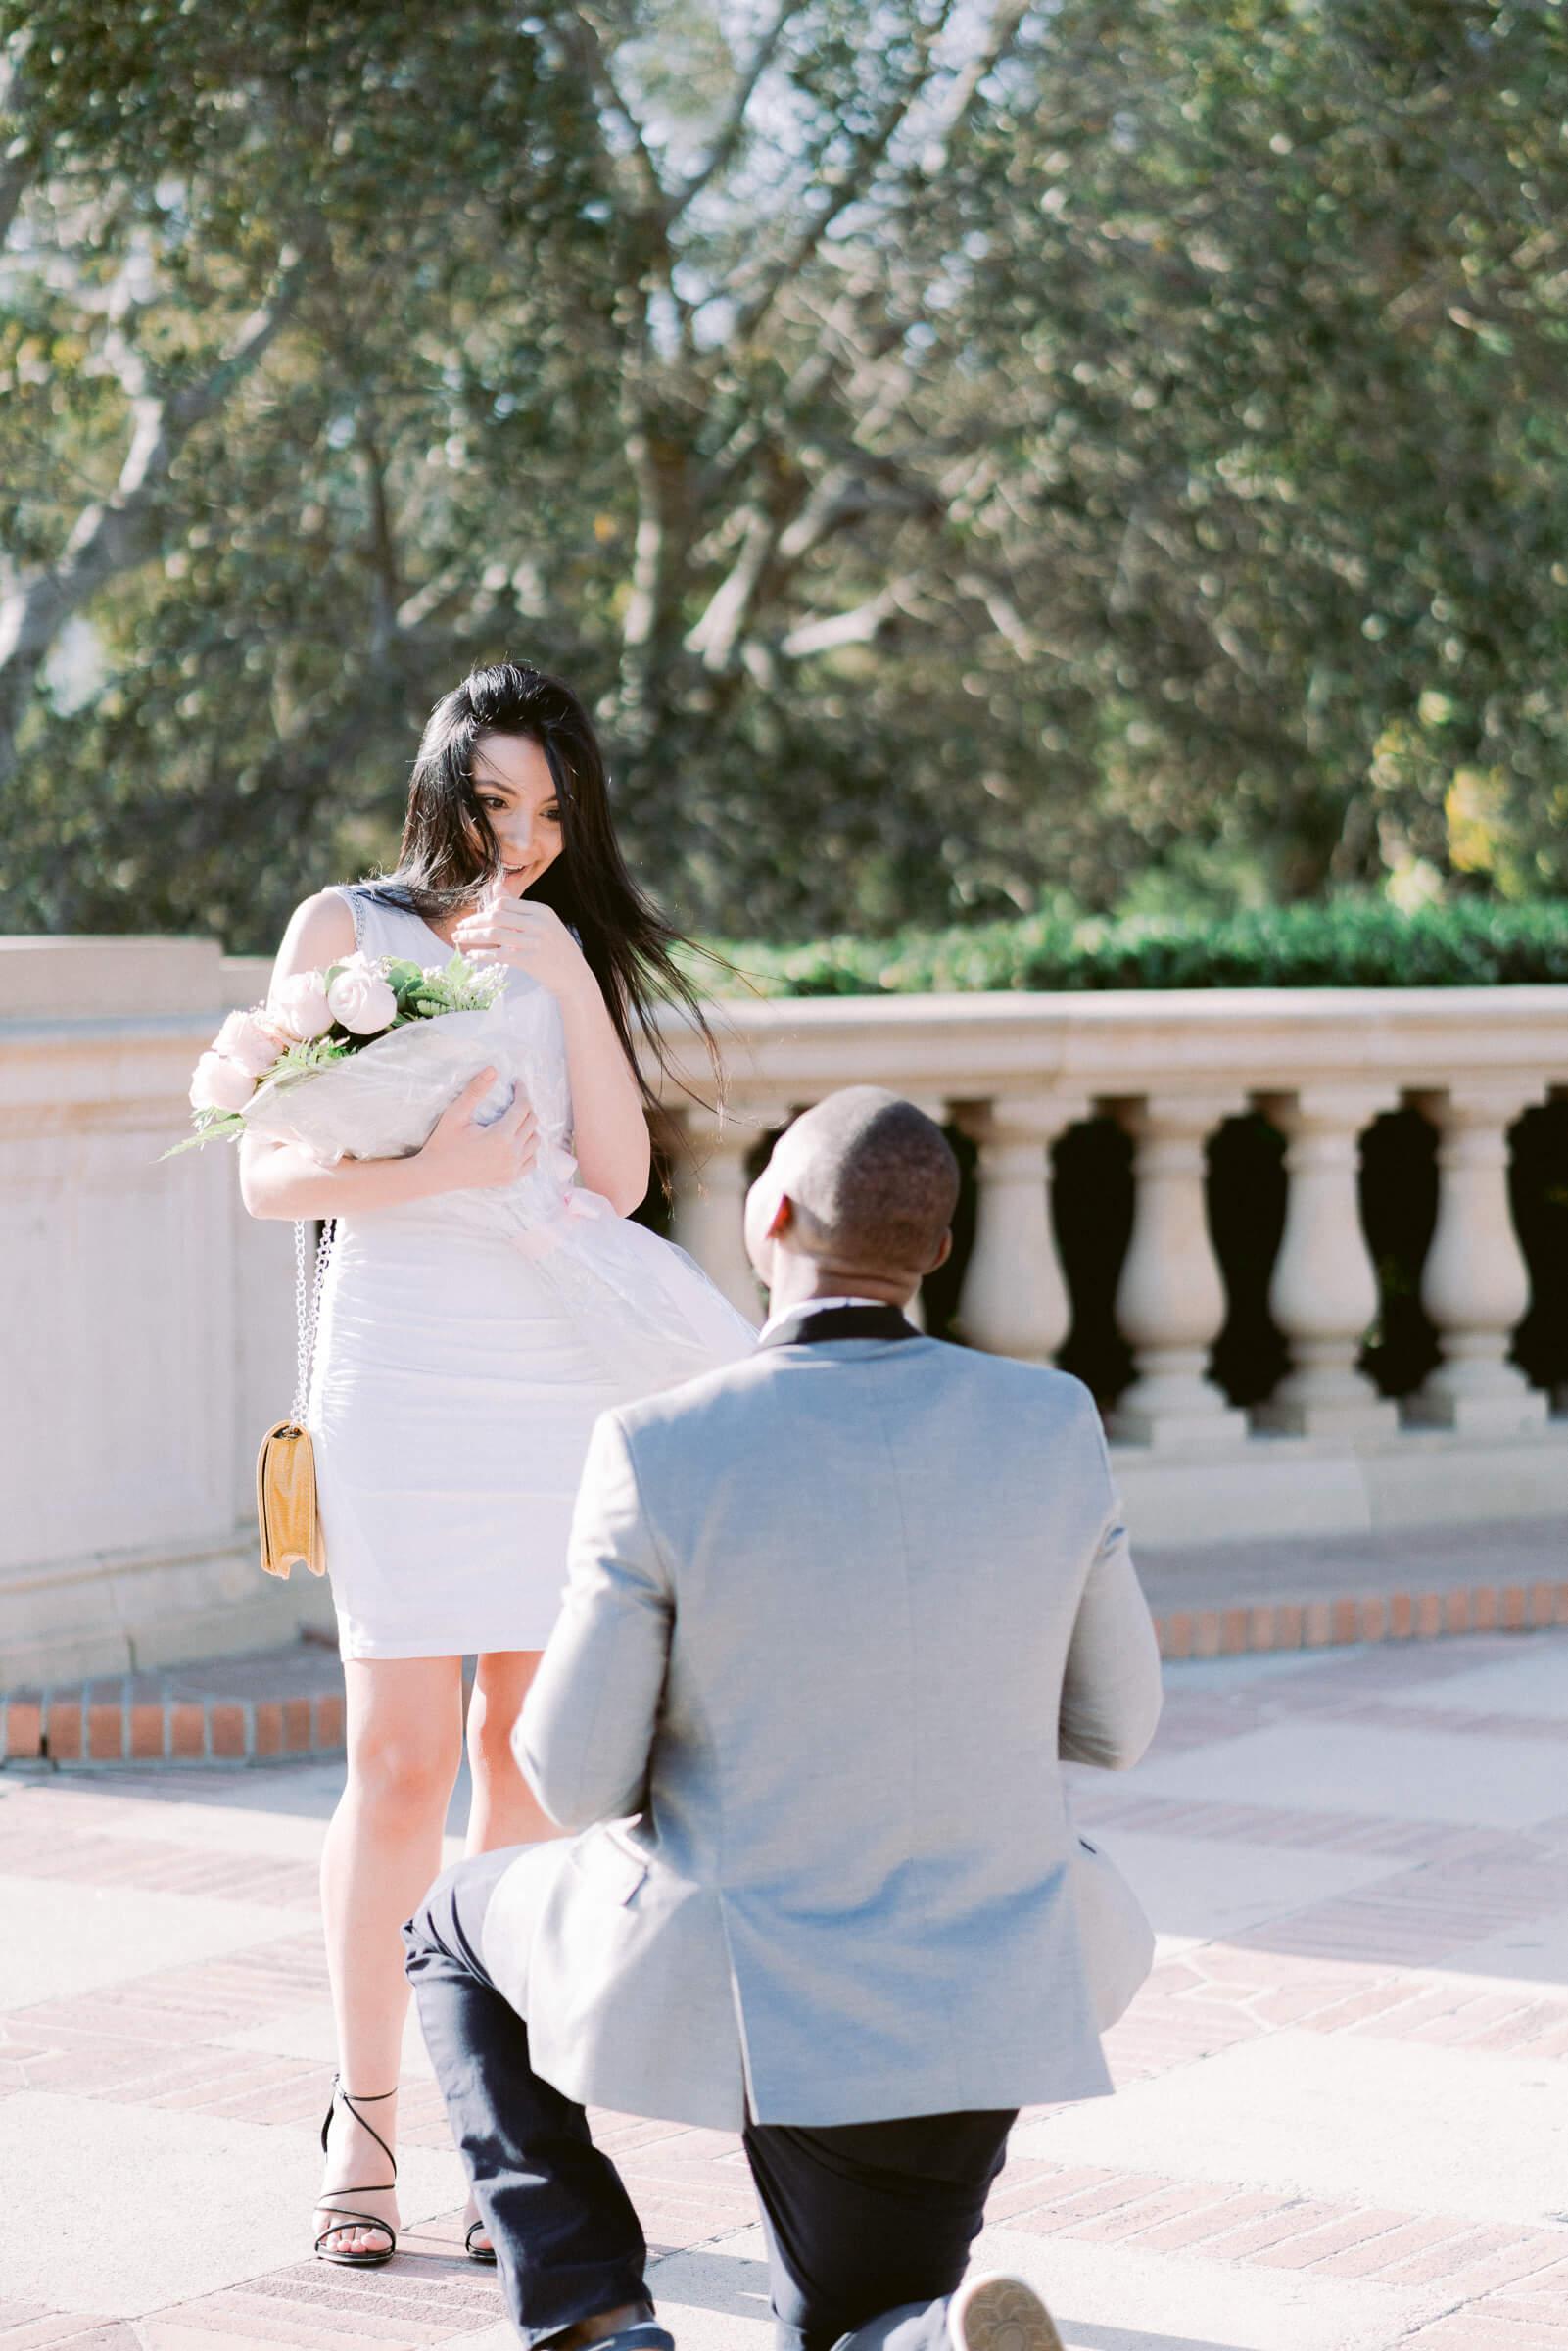 ucla-los-angeles-proposal-photographer-8.jpg